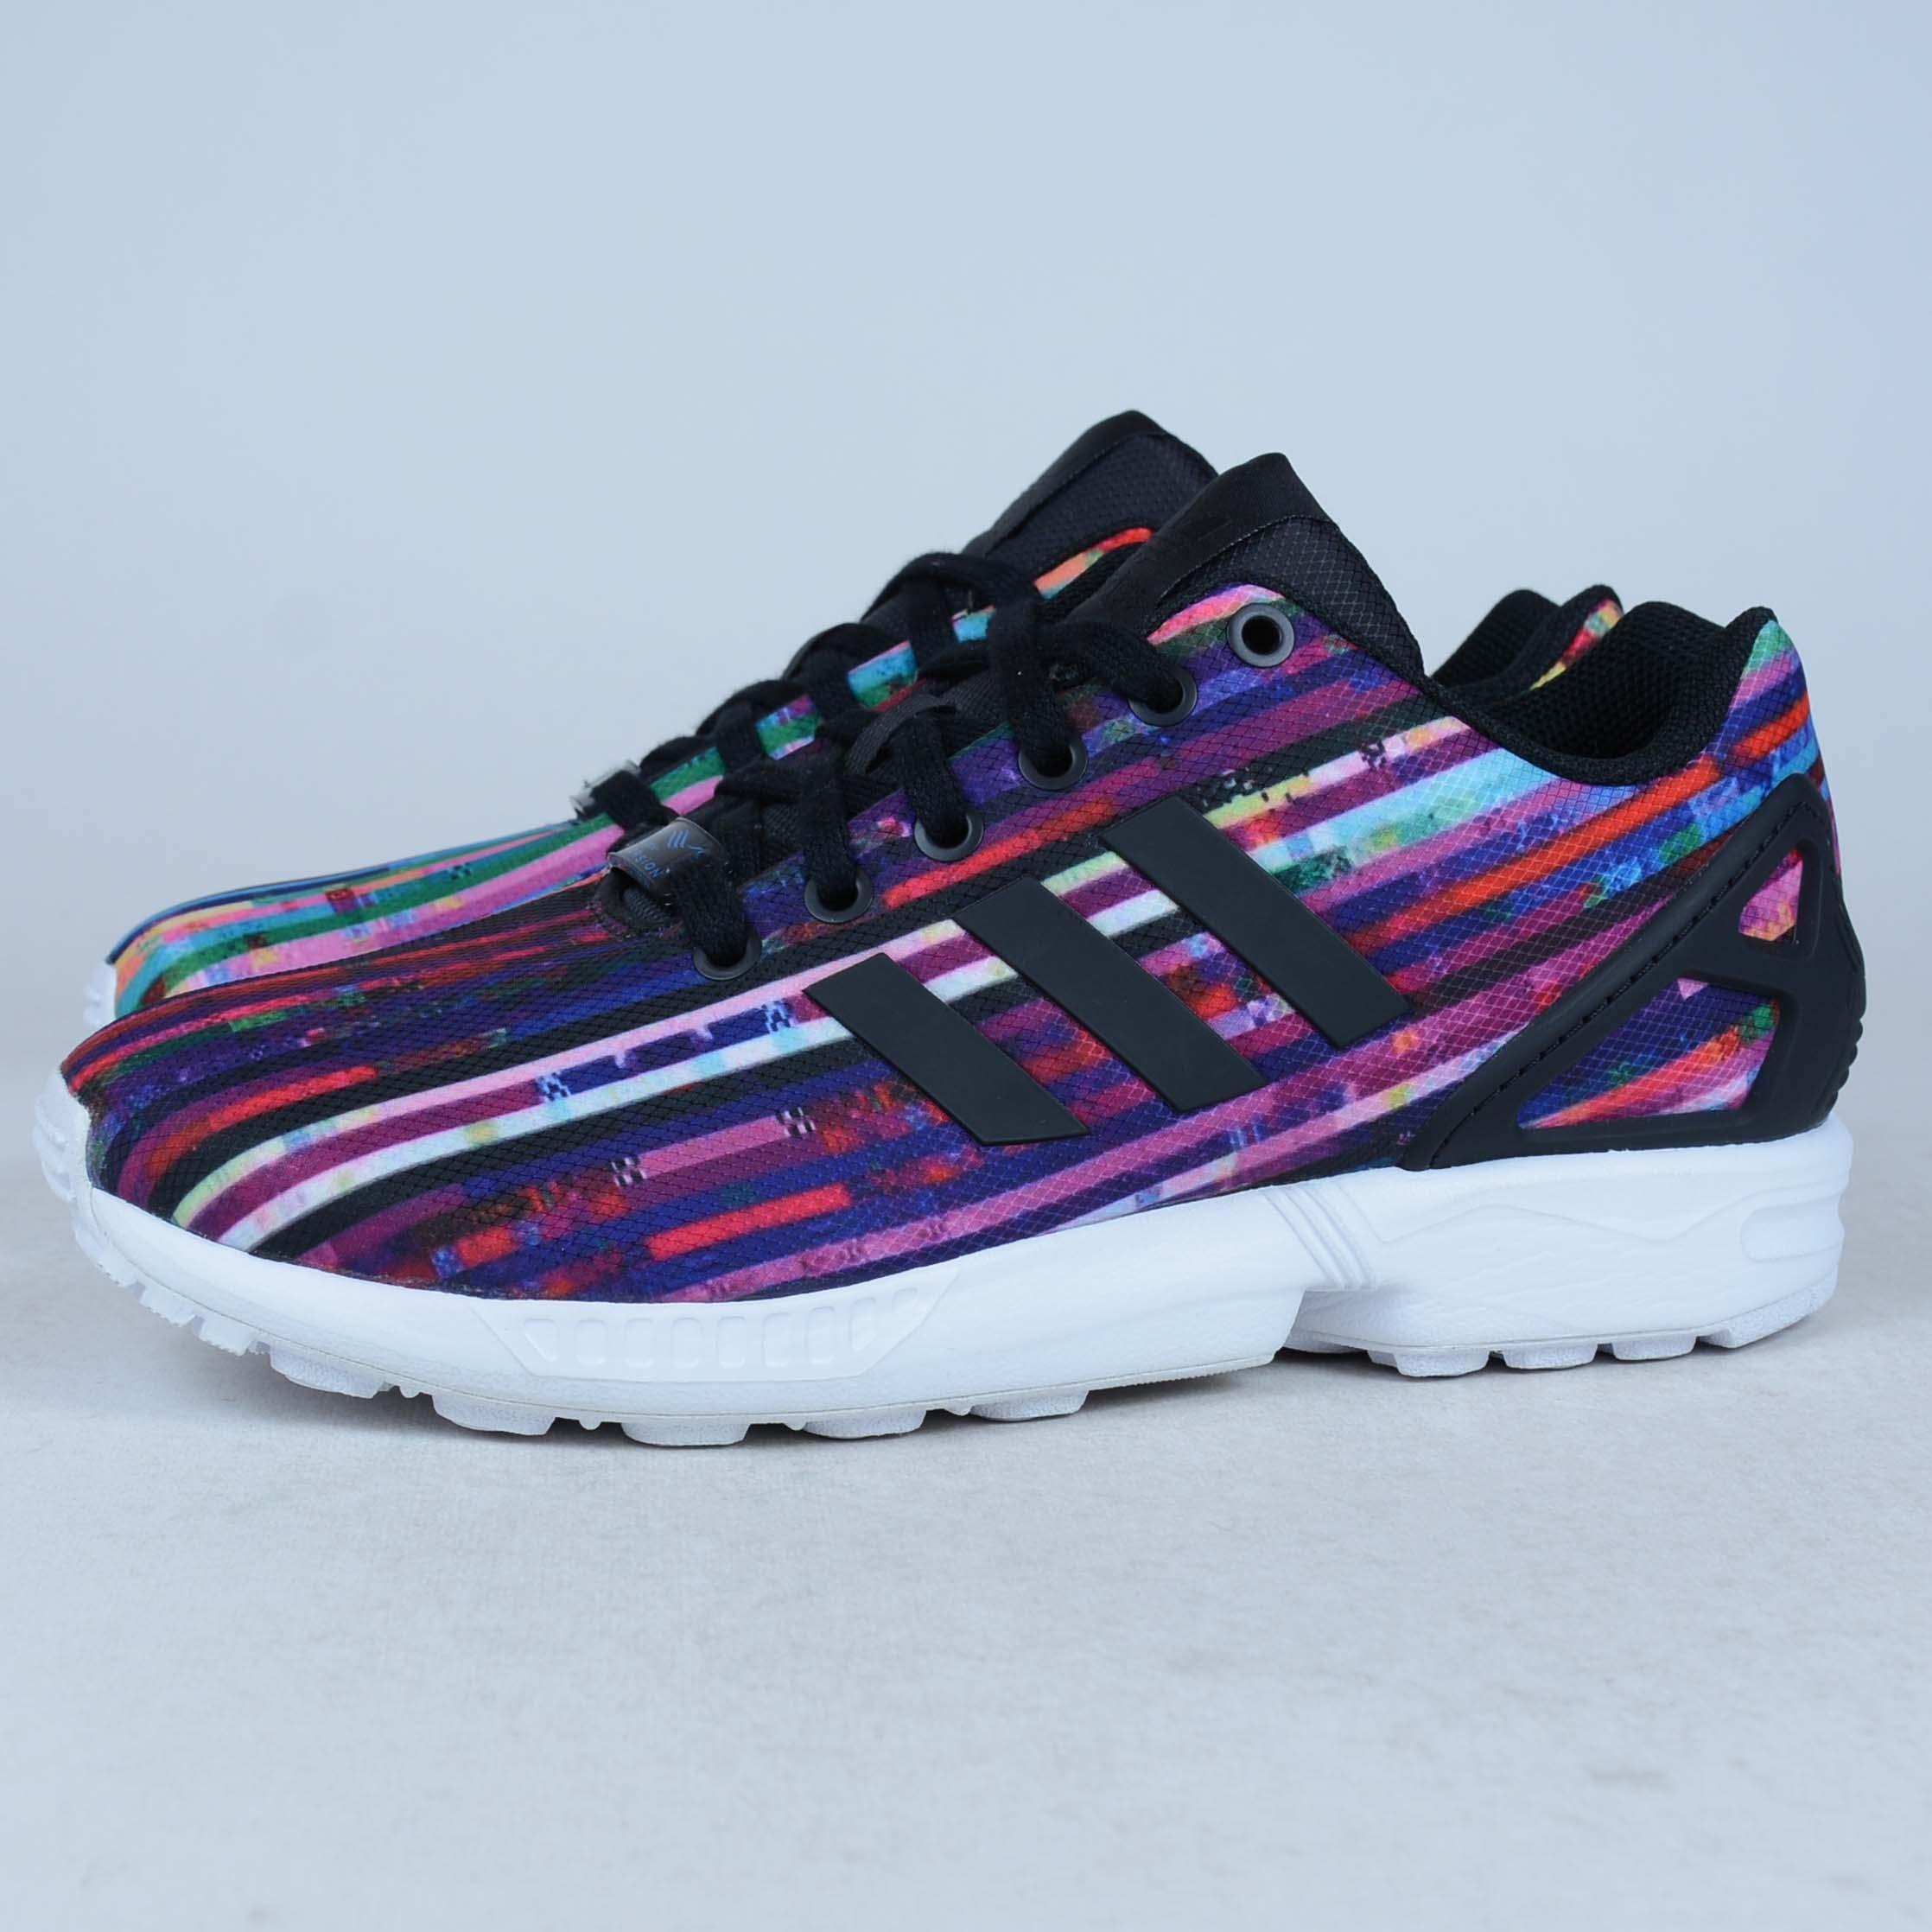 7afcb1fa0 ... real adidas zx flux rainbow multi color size 7.5 running s76504 defect  display ebay 92edb 51461 ...